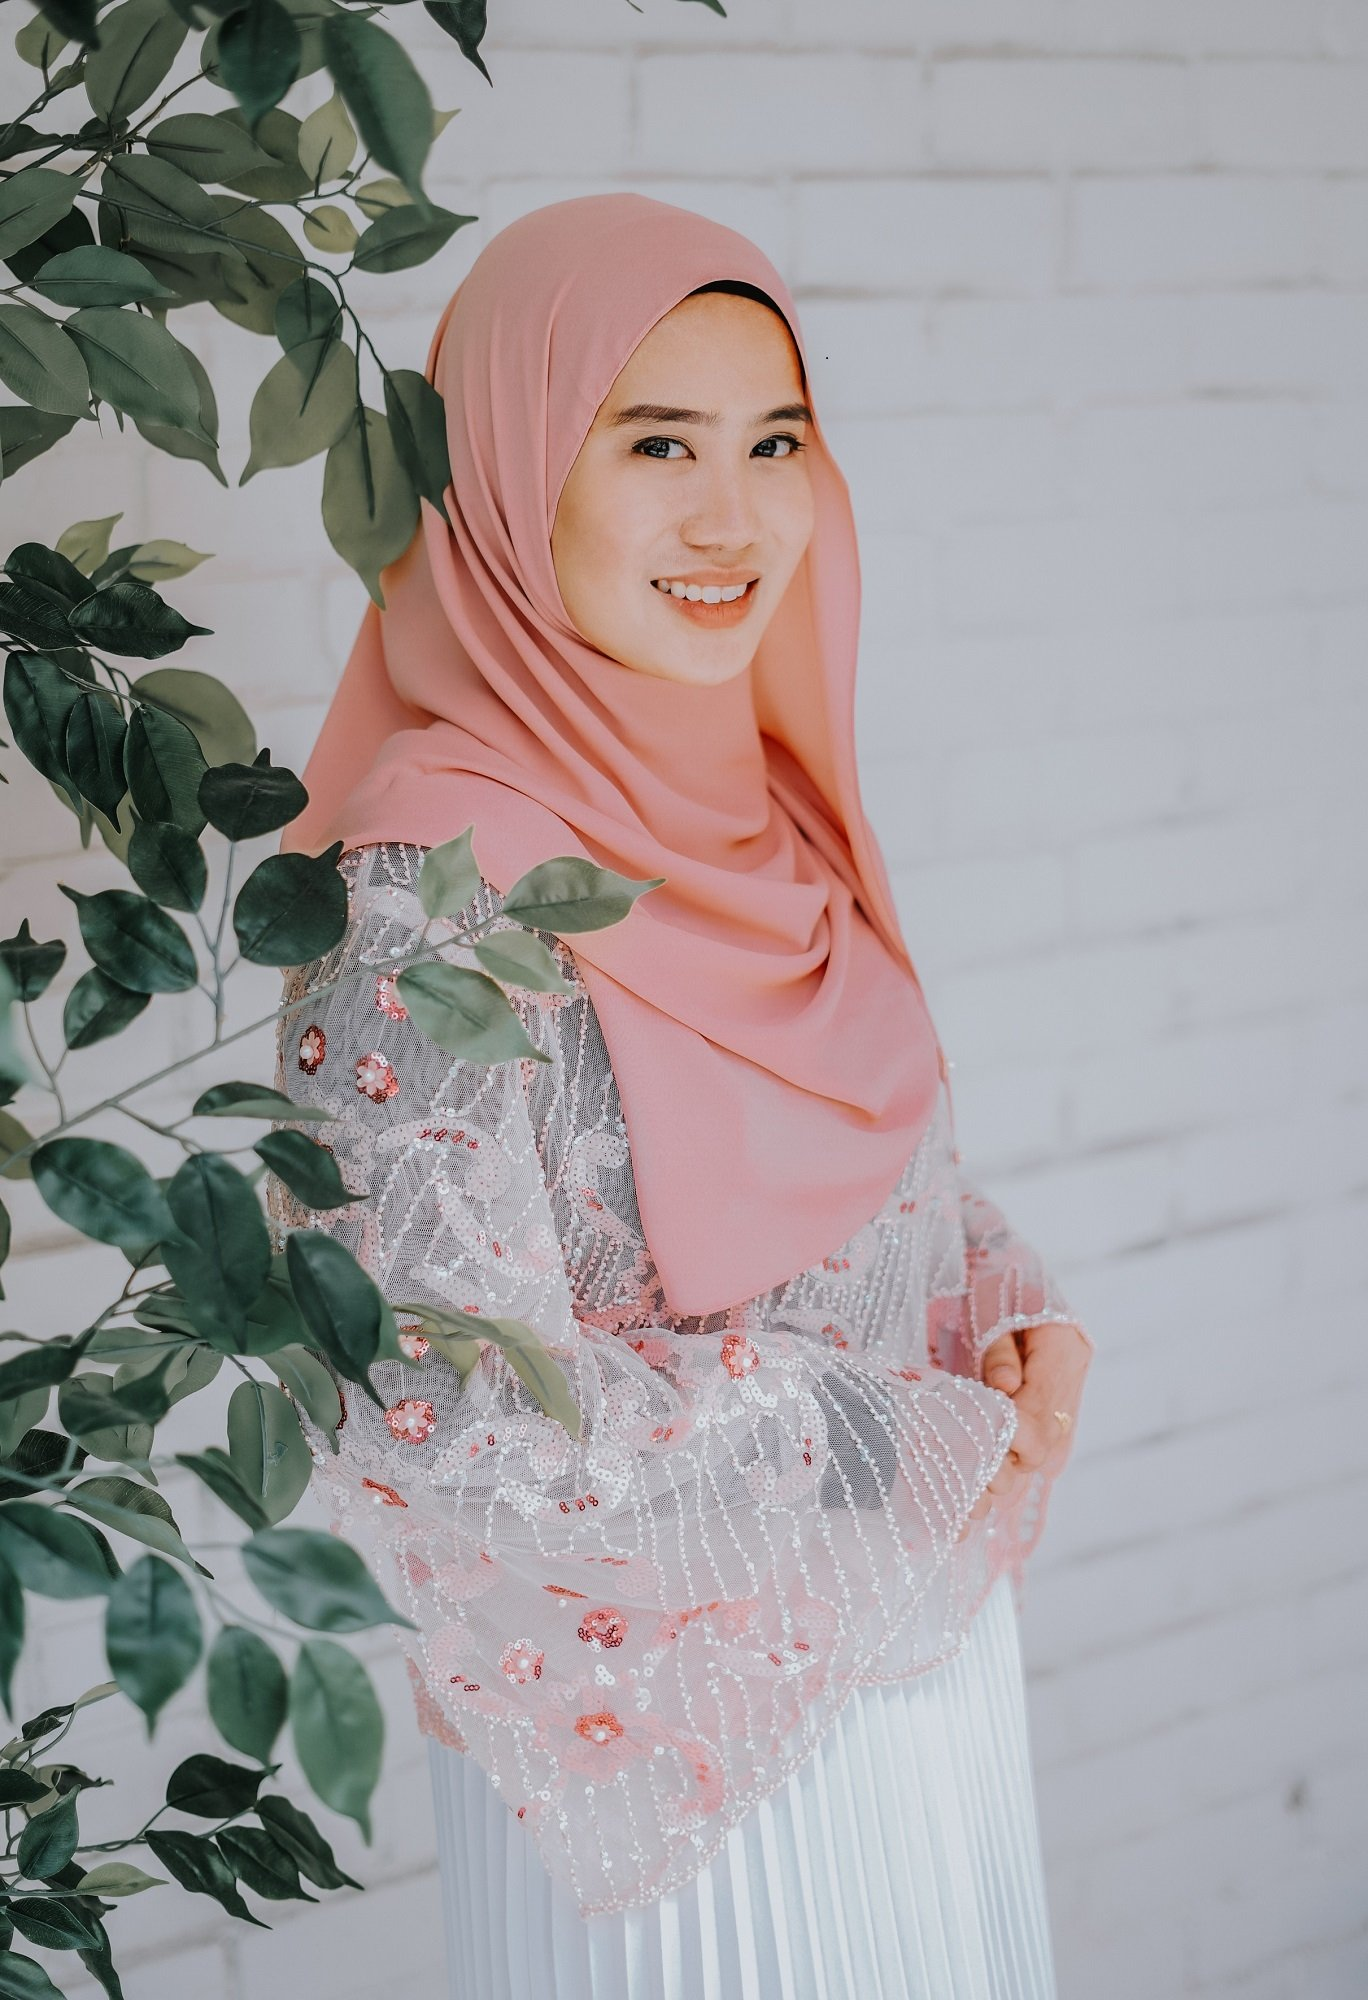 Wanita Asia memakai hijab pashmina pink dan tersenyum